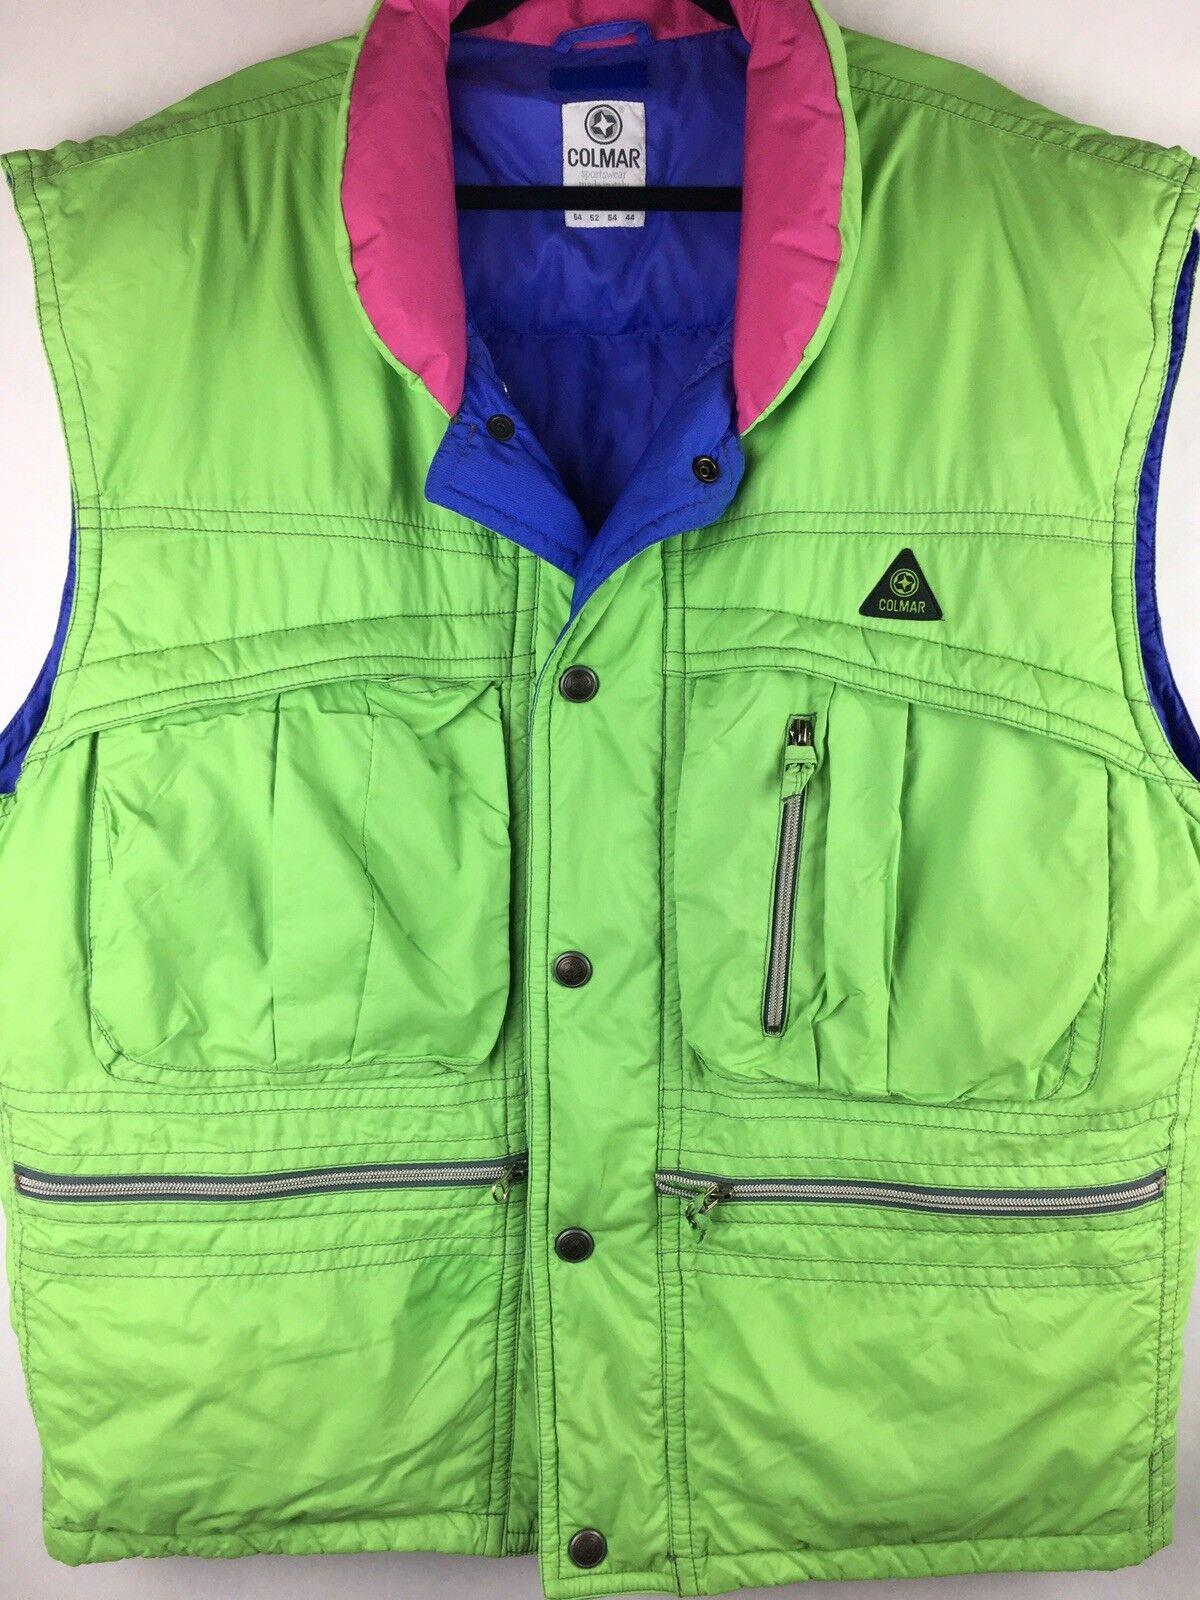 Colmar Sportswear  Size 44 Down Ski Vest  Green Pink Purple  top brand